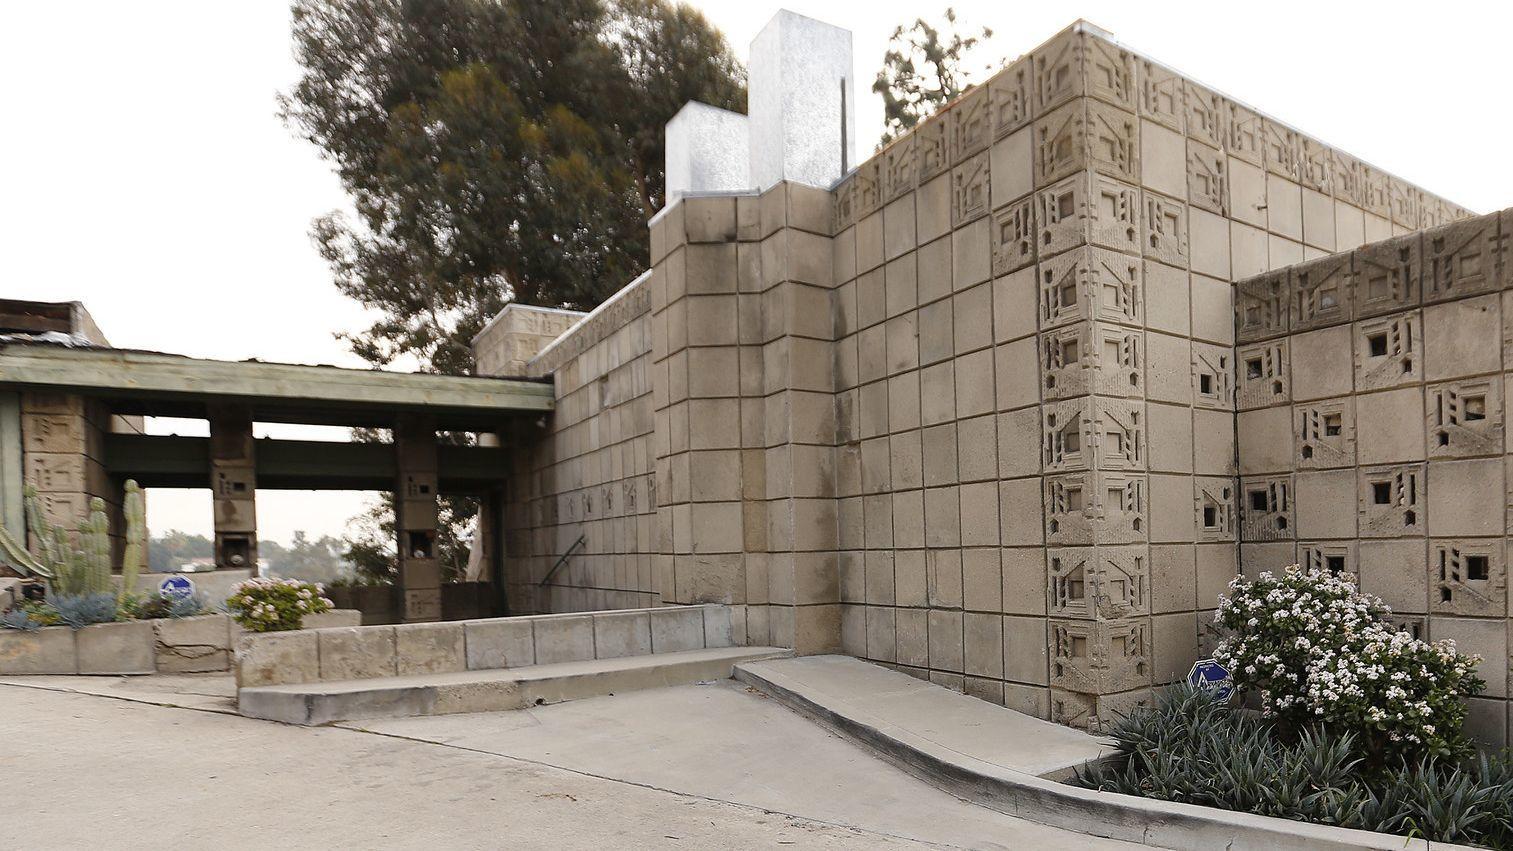 Frank Lloyd Wright's Freeman House is seen in 2019. (Credit: Al Seib / Los Angeles Times